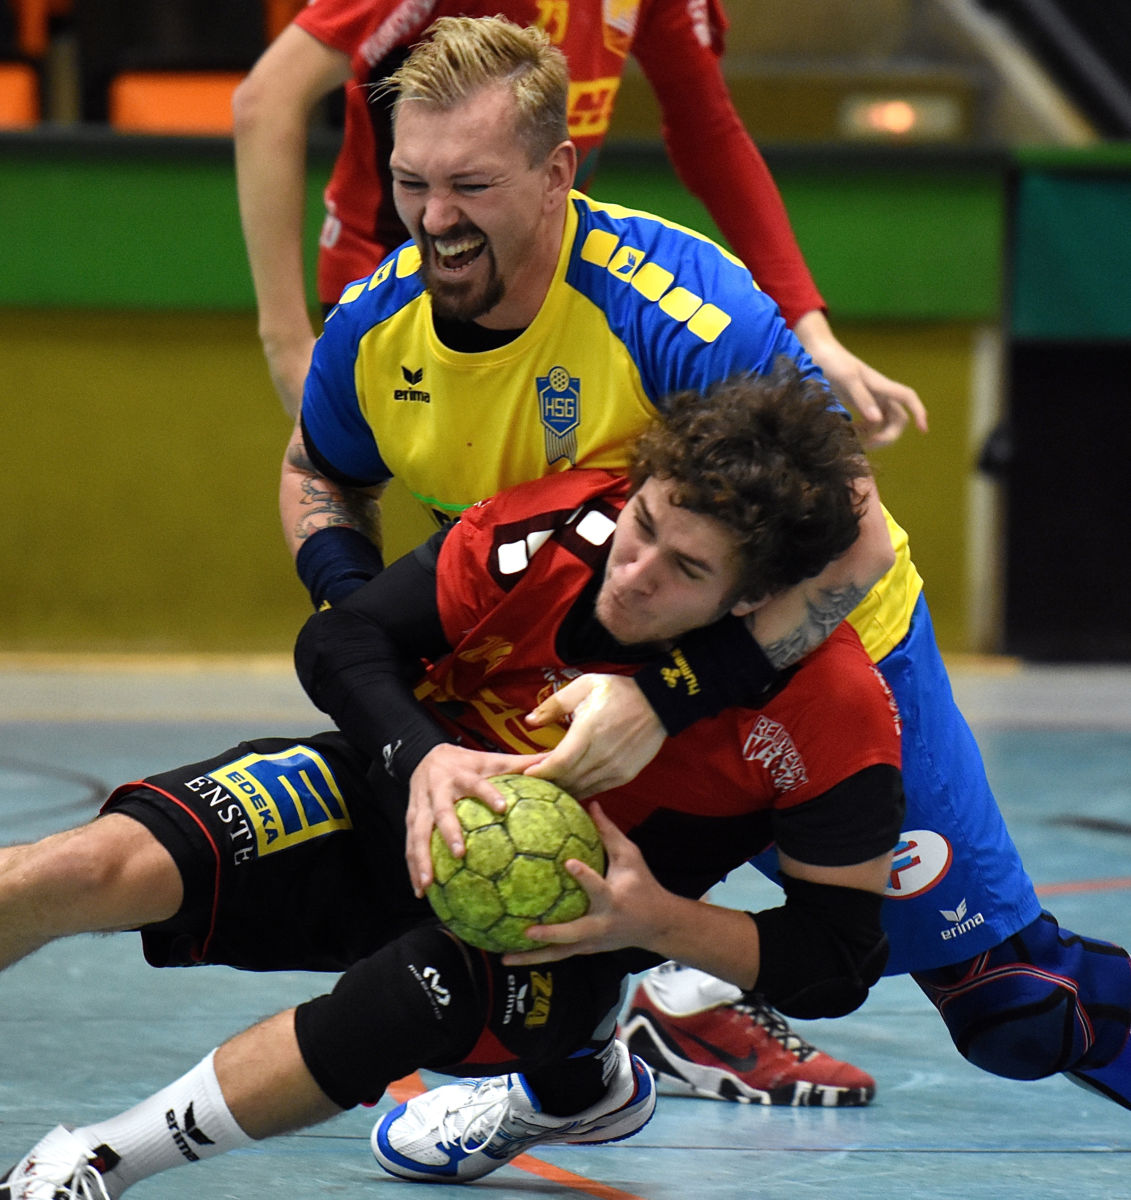 LokalsportMZV Handball Westfalenpokal HSG Lüdenscheid DJK Bösperde CVJM Gevelsberg